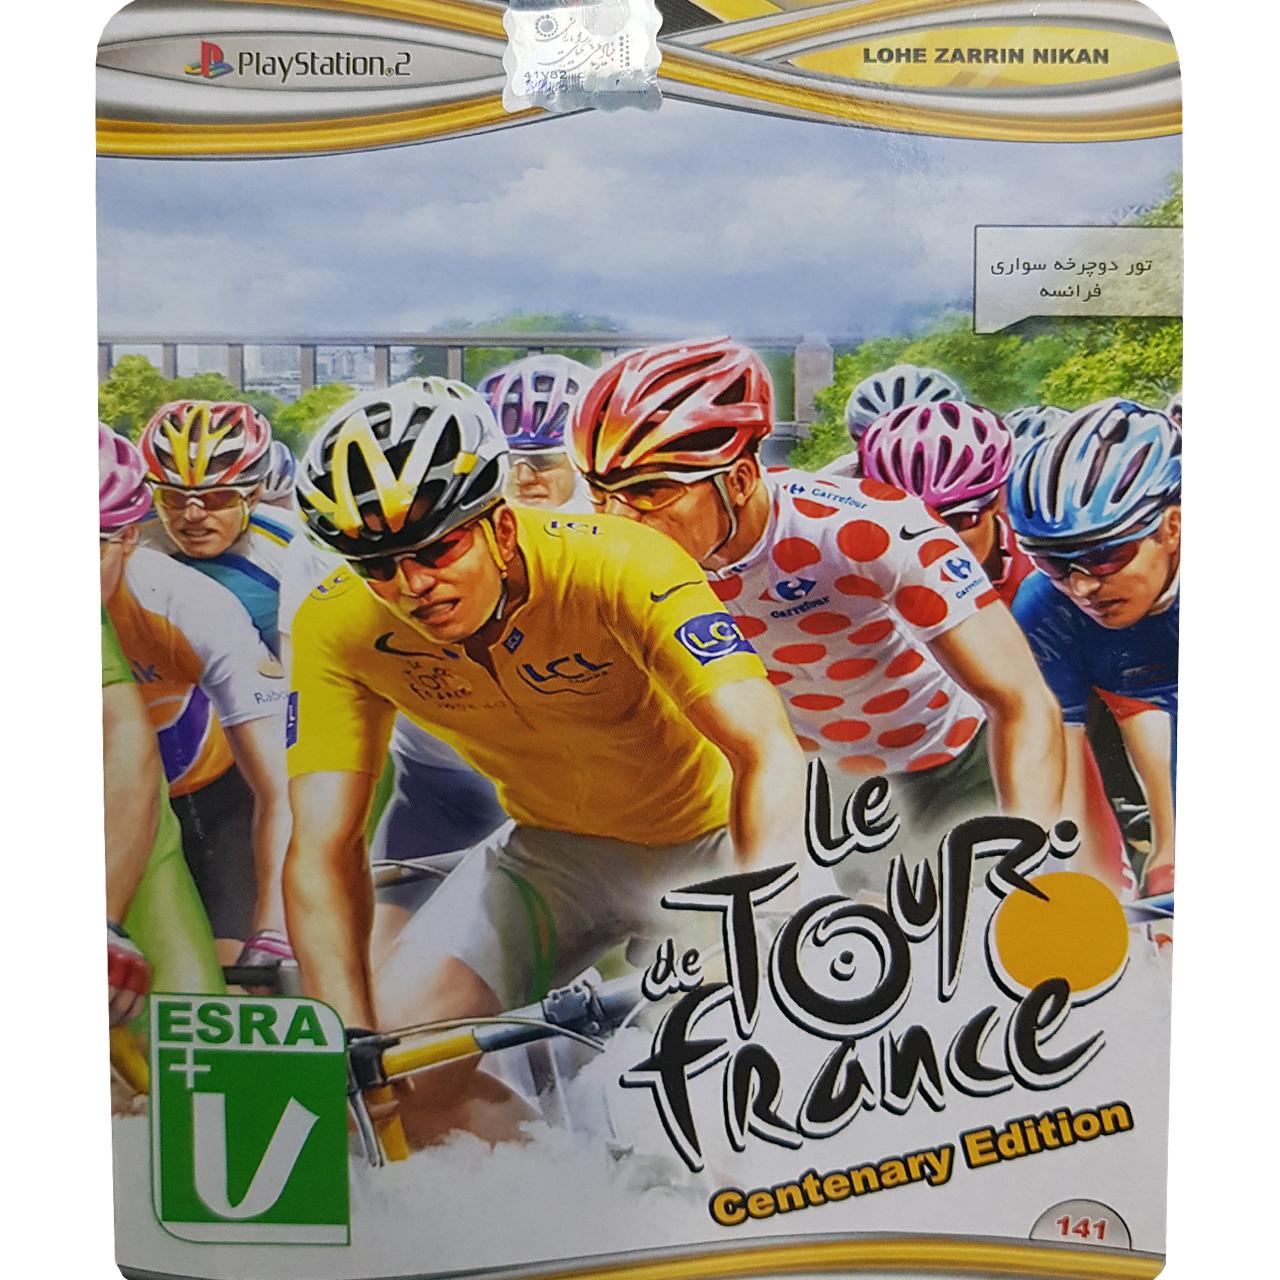 بازی Tour de France مخصوص PS2 نشر لوح زرین